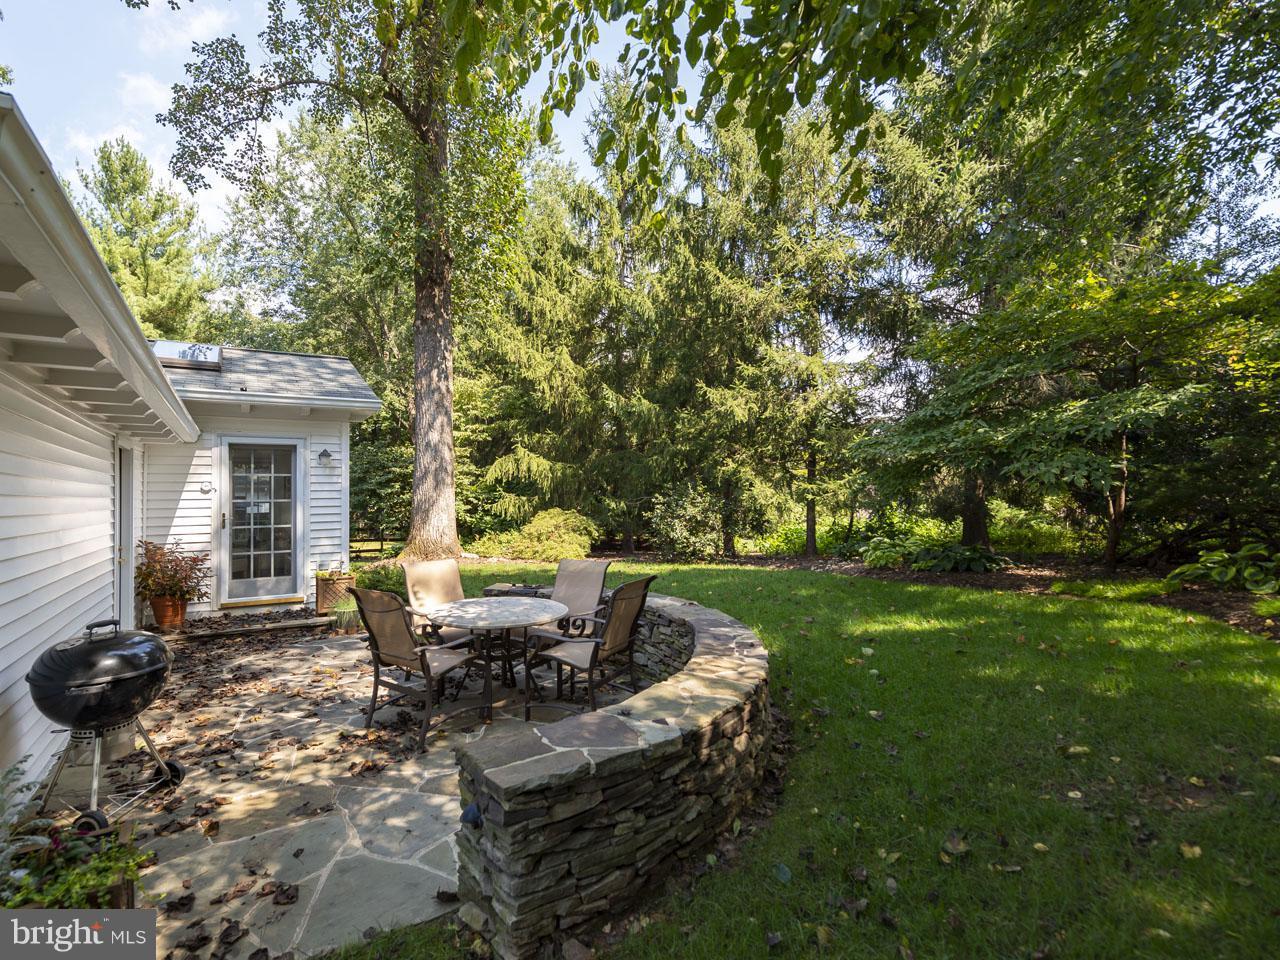 1006211278-300688039164-2021-07-22-07-39-39        Burke Delaware Real Estate For Sale   MLS# 1006211278  - Best of Northern Virginia